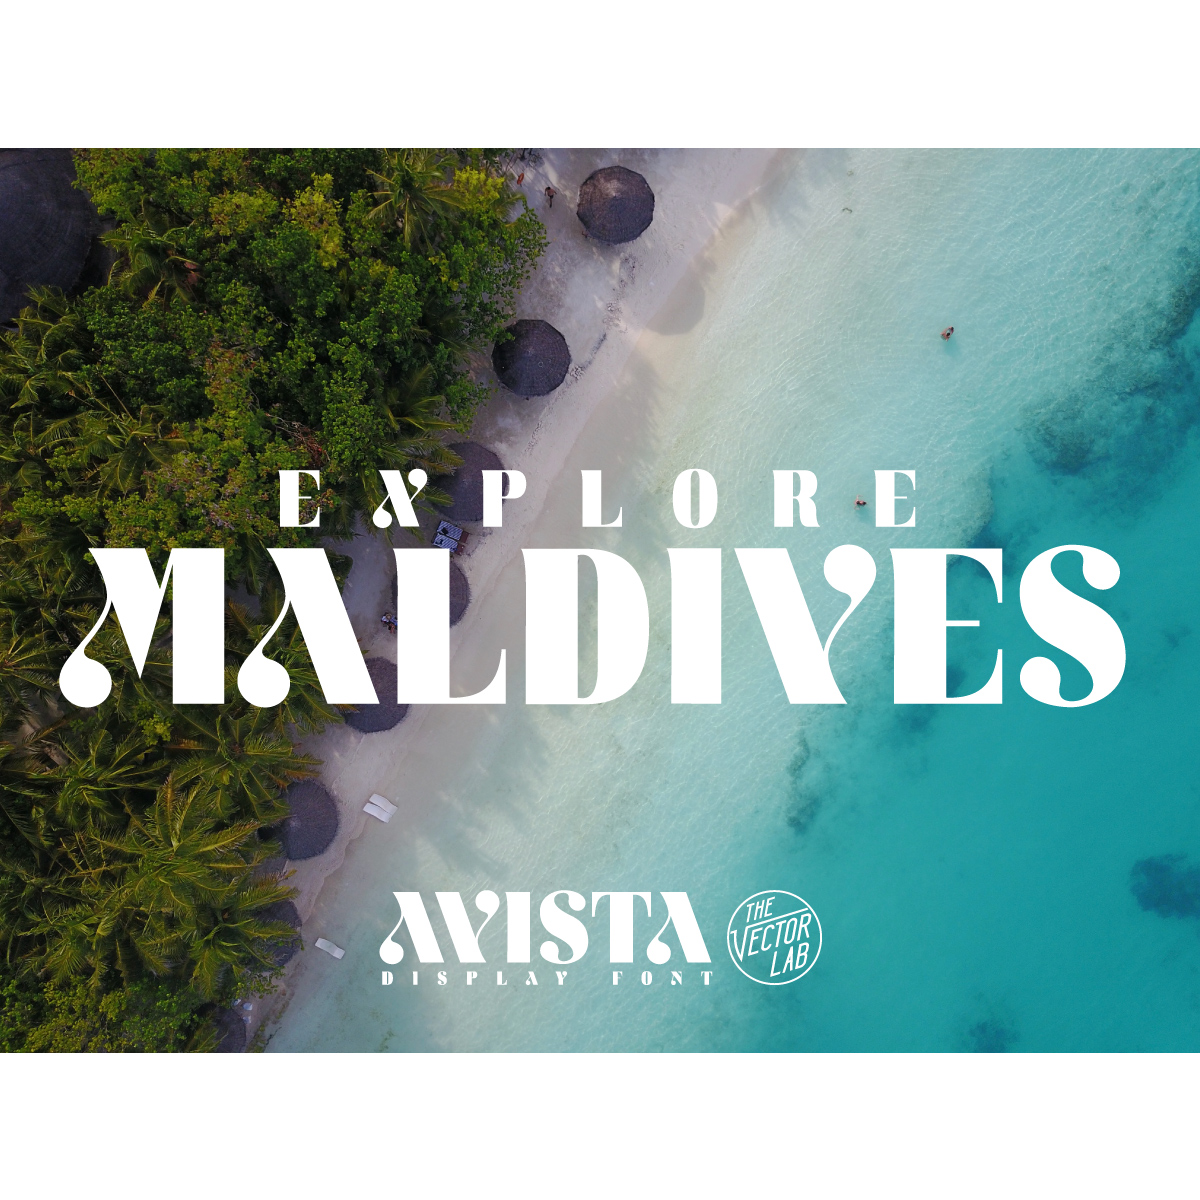 Explore Maldives - AVISTA font by Ray Dombroski & TheVectorLab